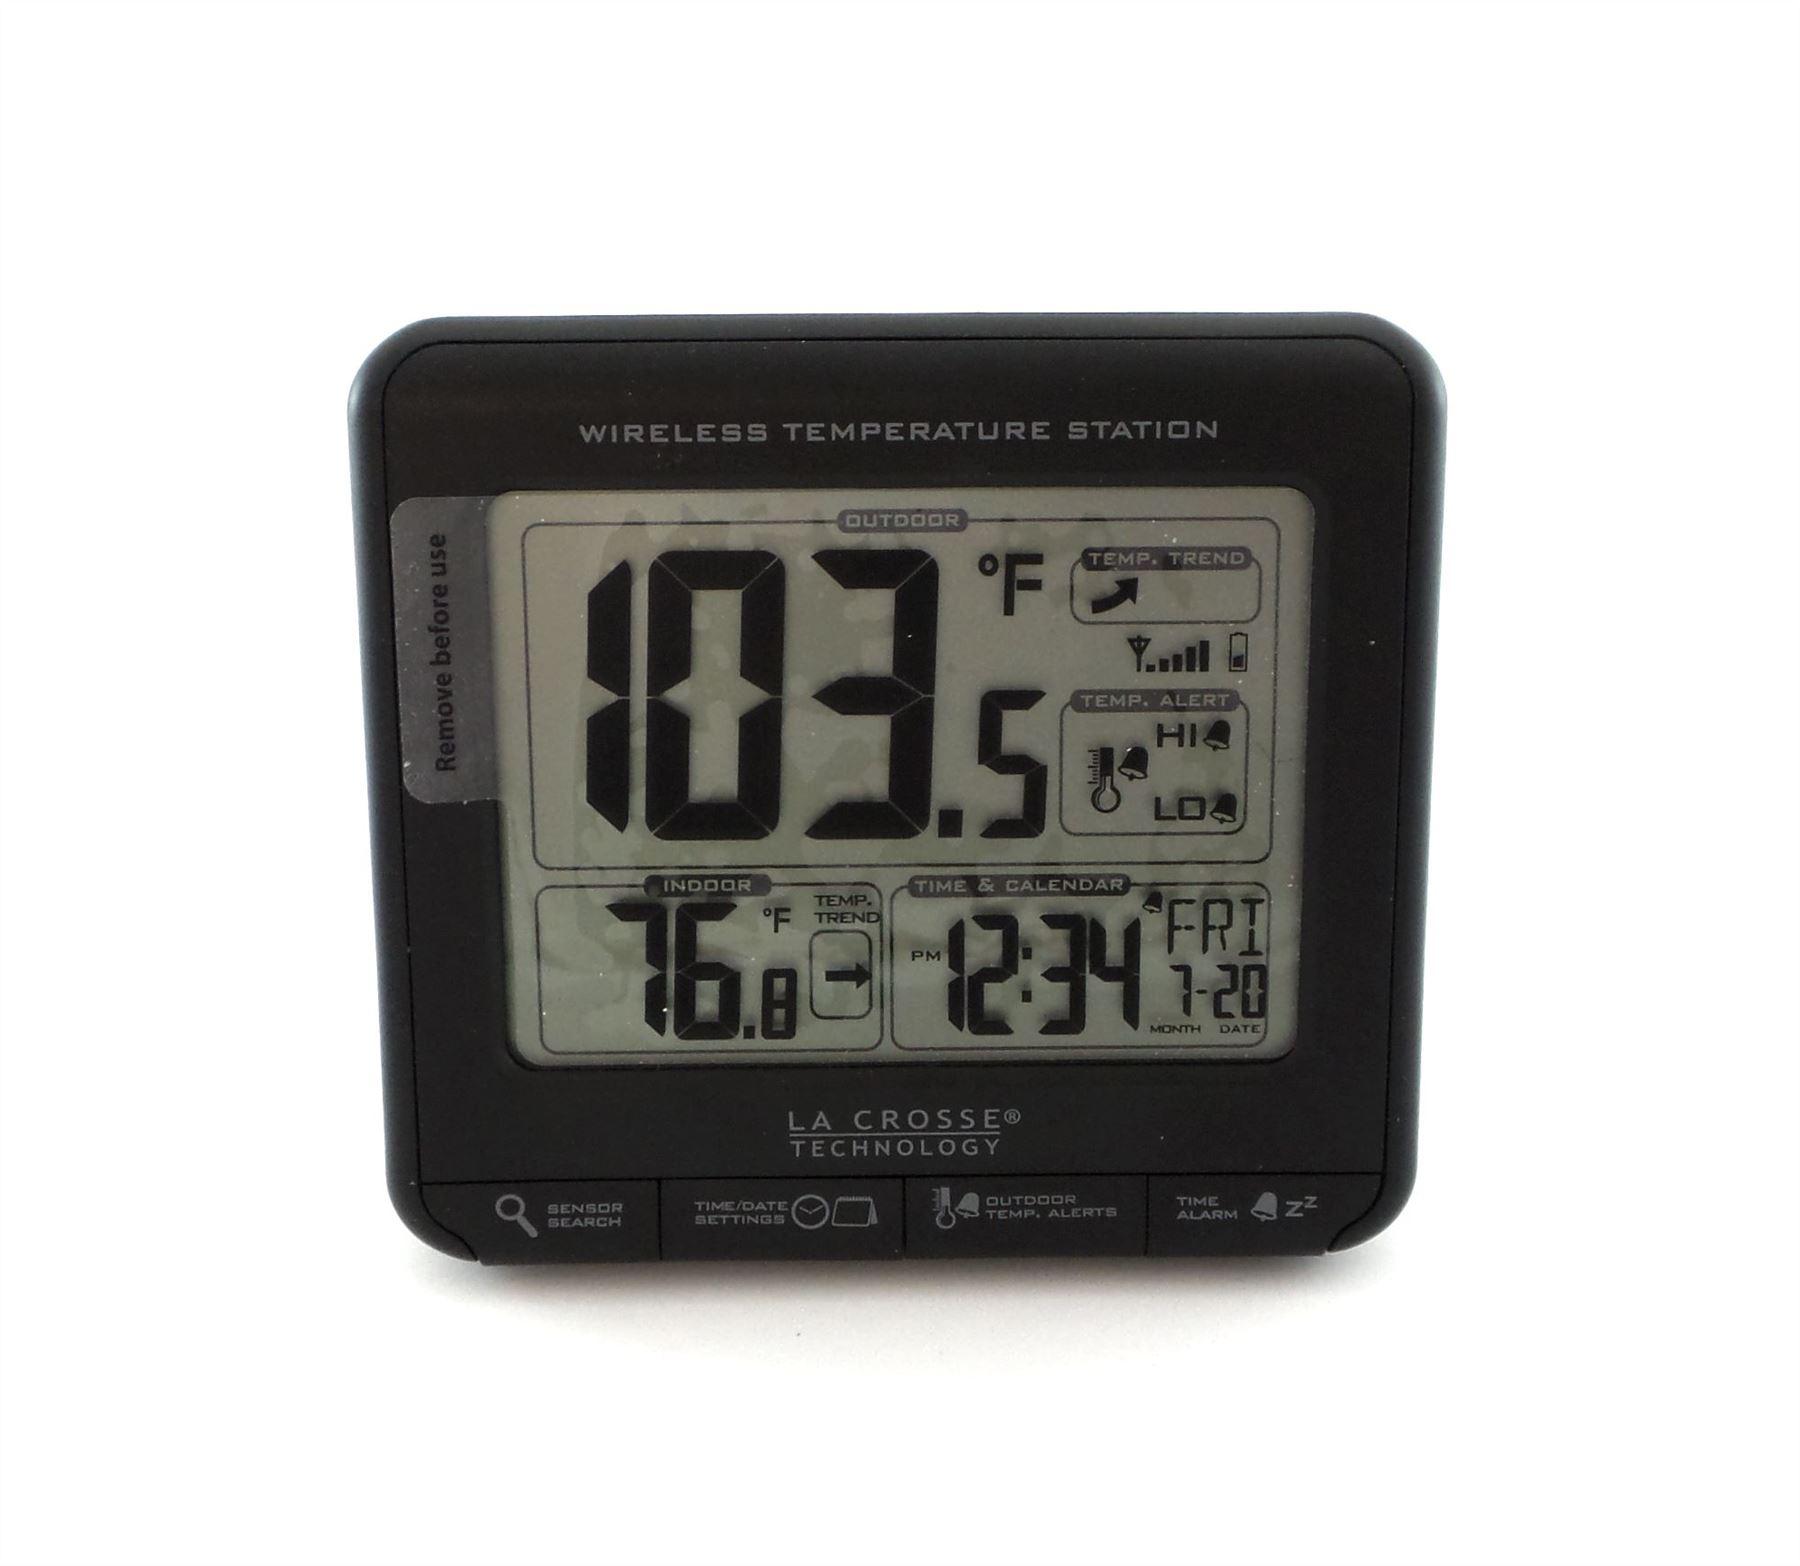 La Crosse Technology T Wireless Temperature Station